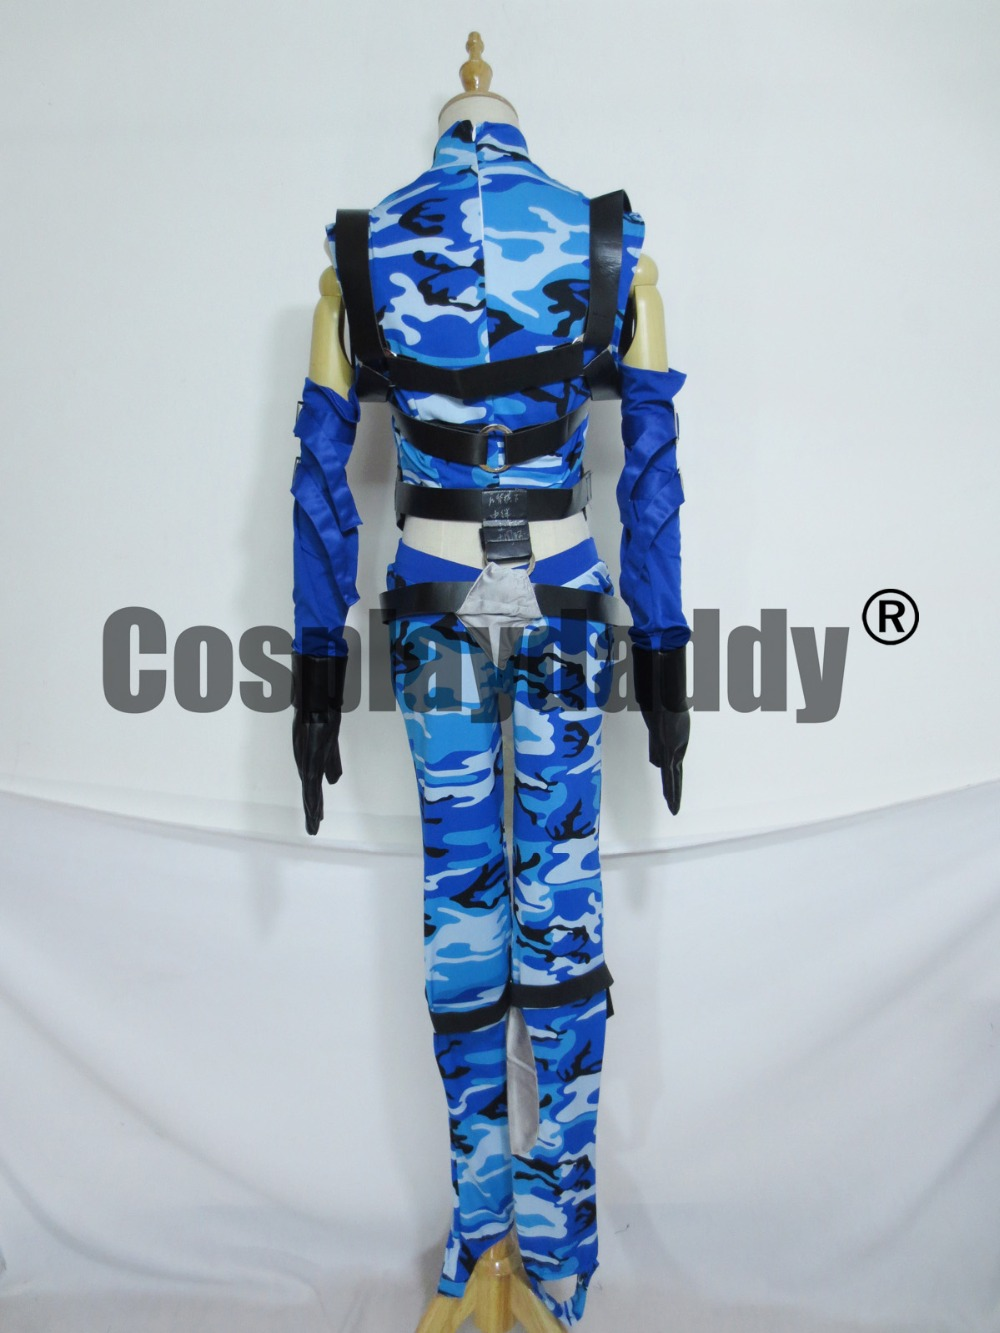 Kematian Dengan Derajat Tekken Nina Williams Outfit Cosplay Costume L005 Cosplay Costume Costume Cosplaydeath Costume Aliexpress